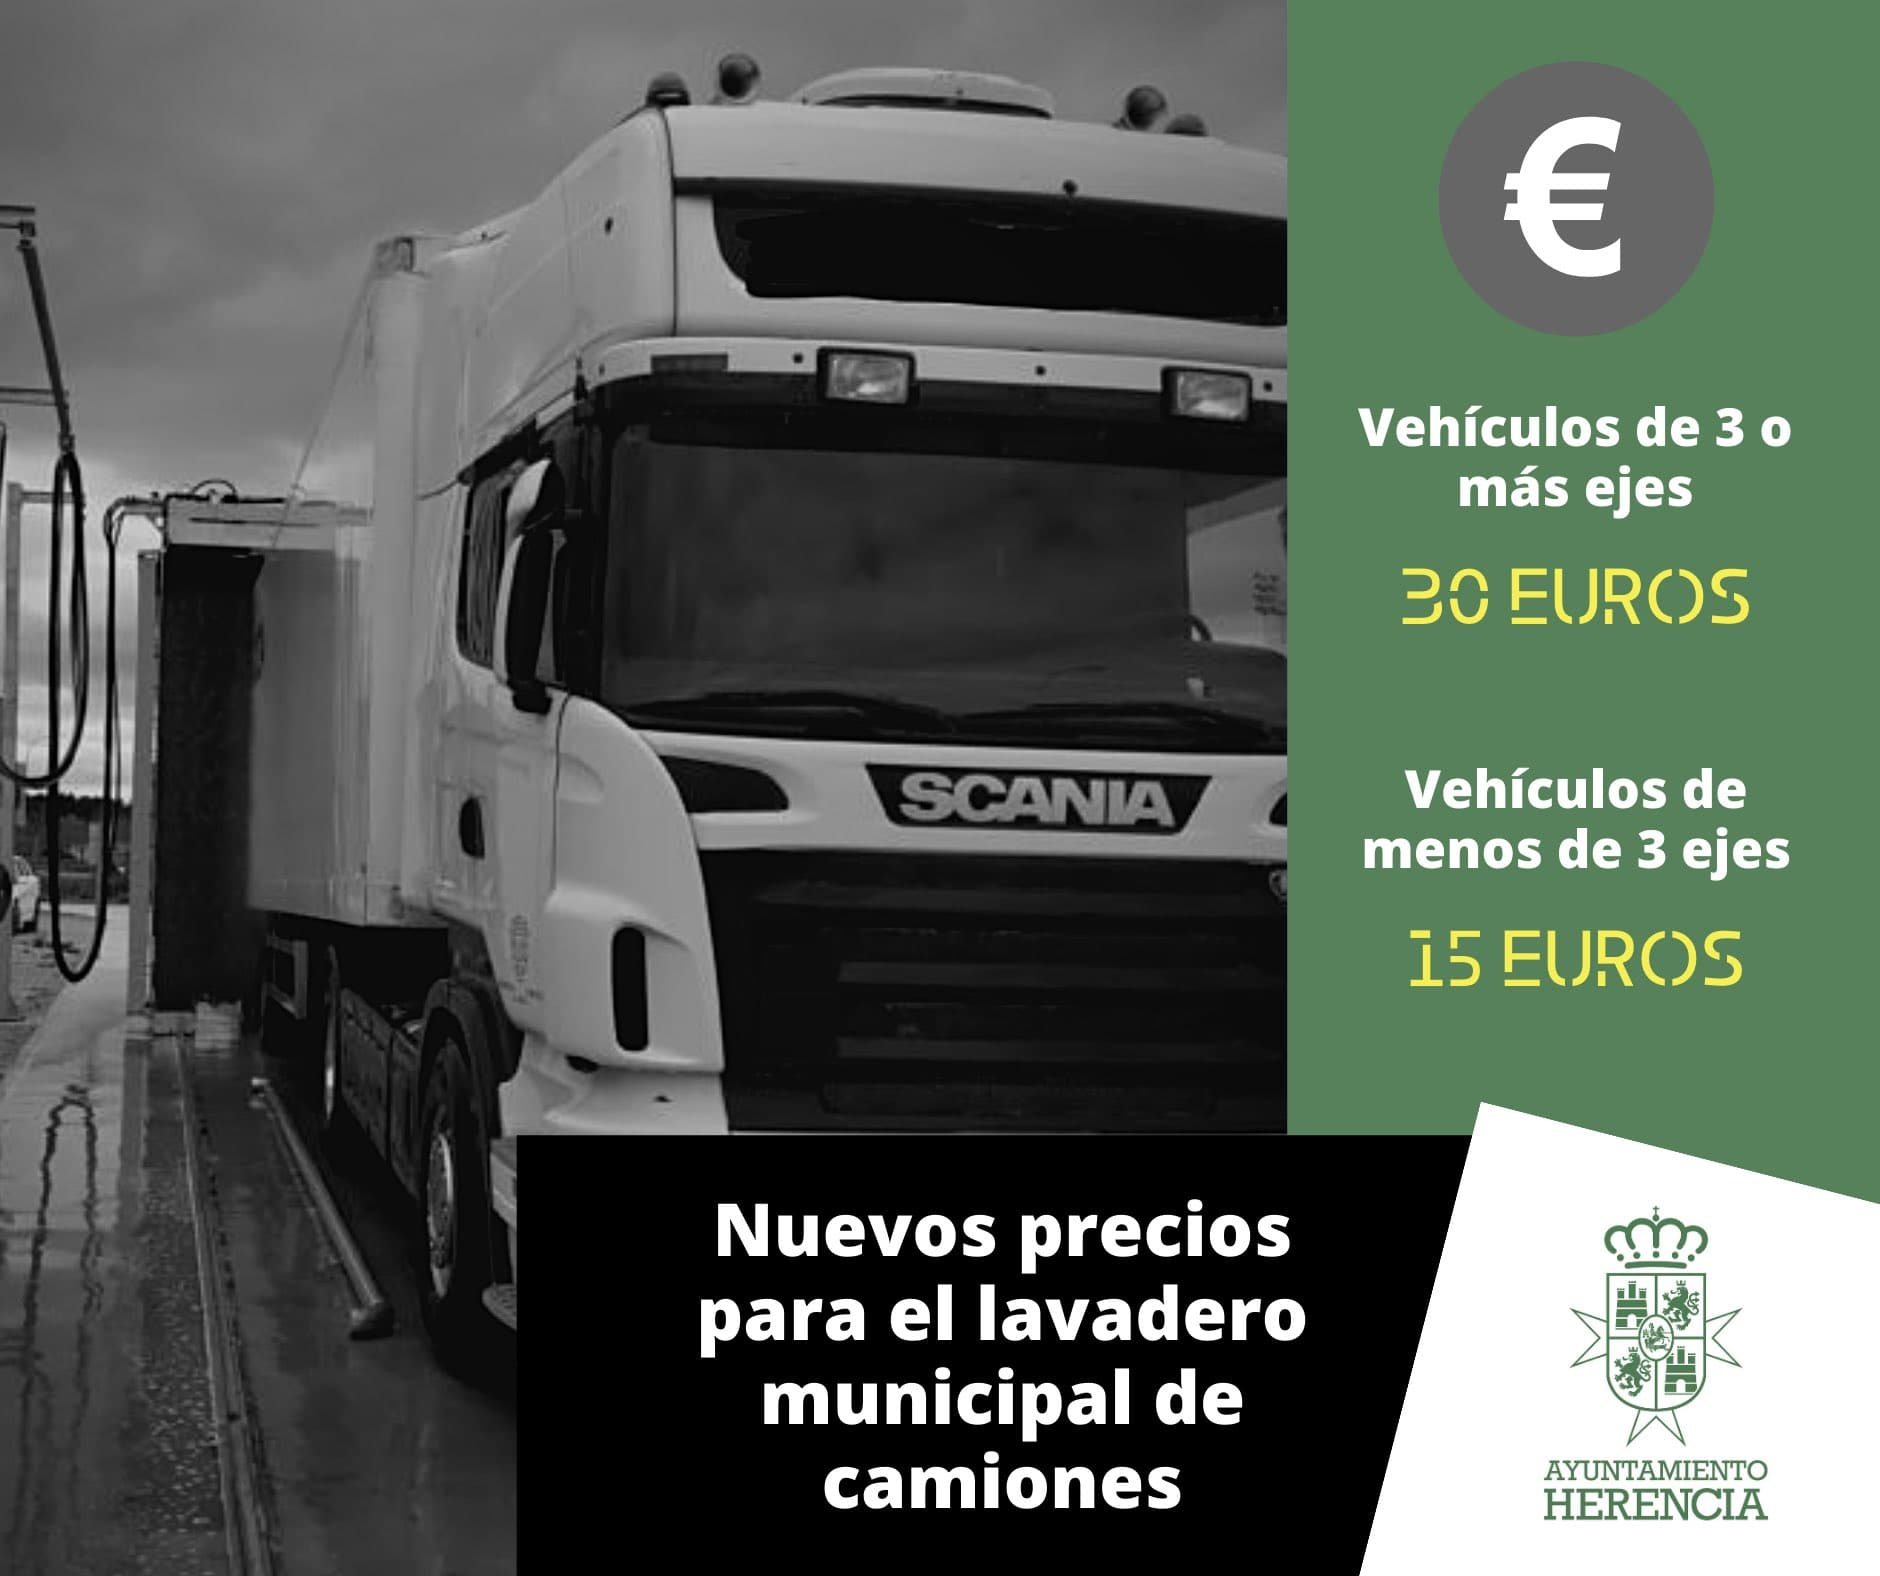 La tasa del lavadero municipal de camiones en Herencia actualizada a la baja 3